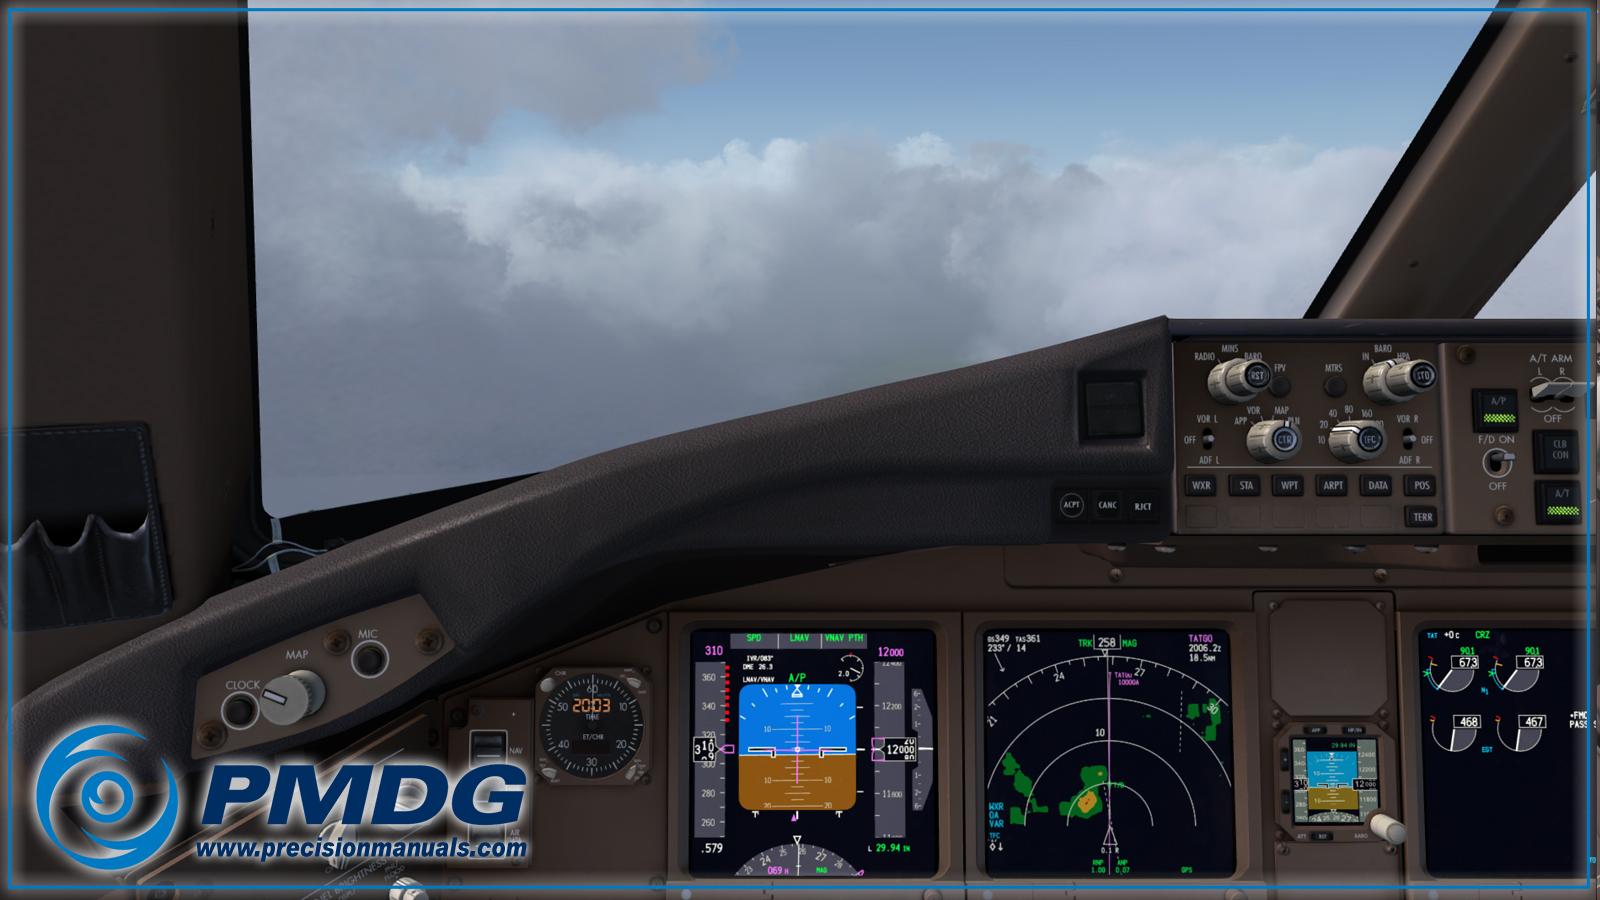 pmdg_777_radar6.jpg